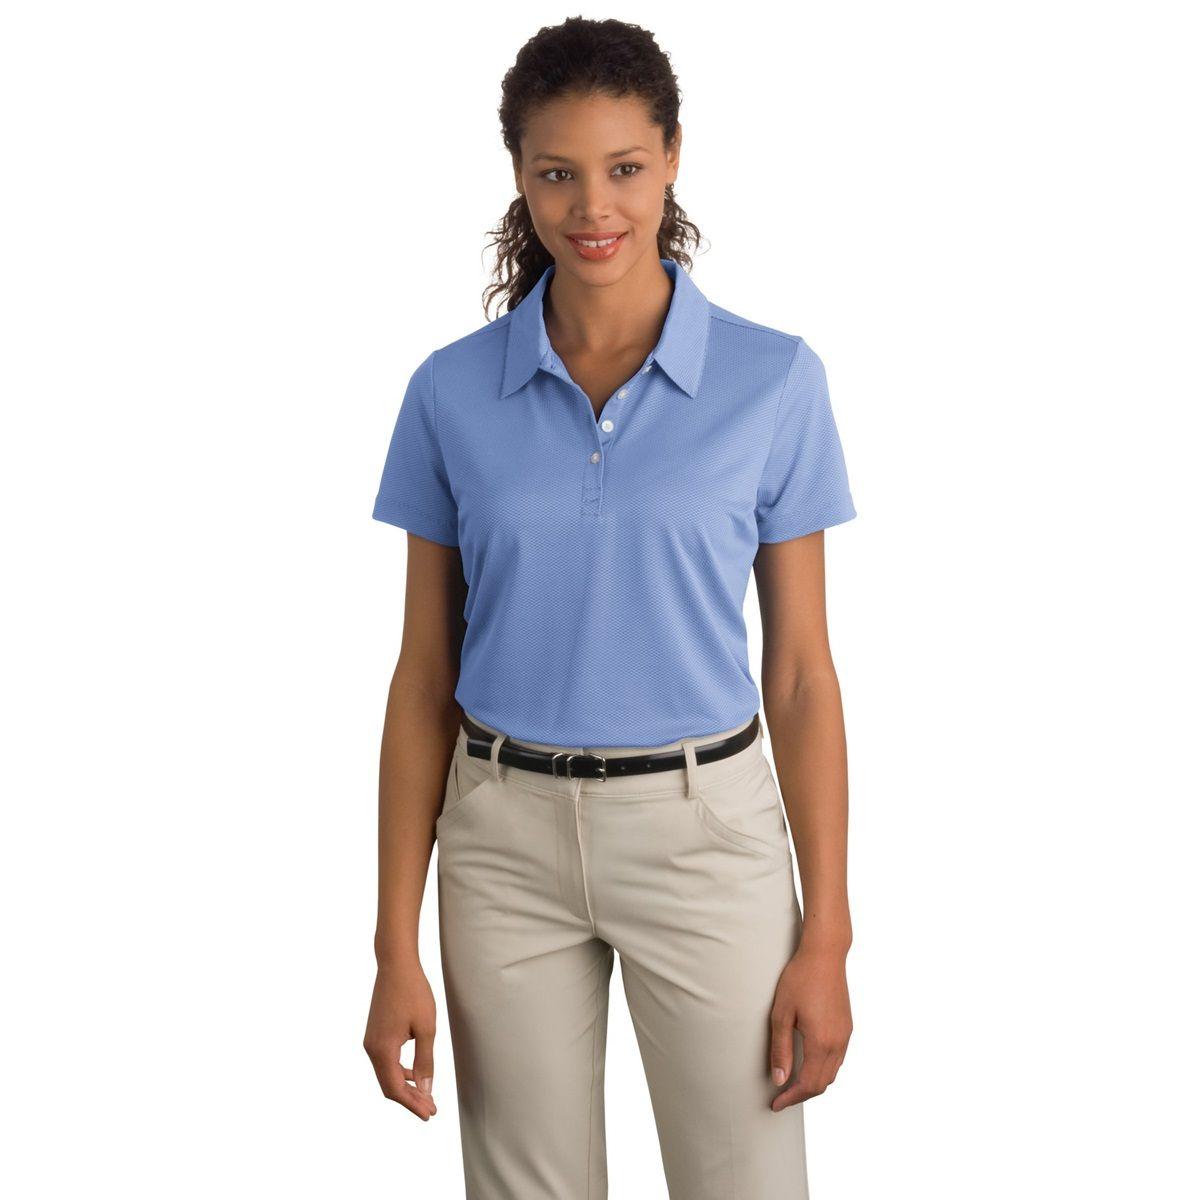 Nike 358890 Ladies Sphere Dry Diamond Polo Light Blueberry Polo Shirt Women Nike Women Sports Shirts